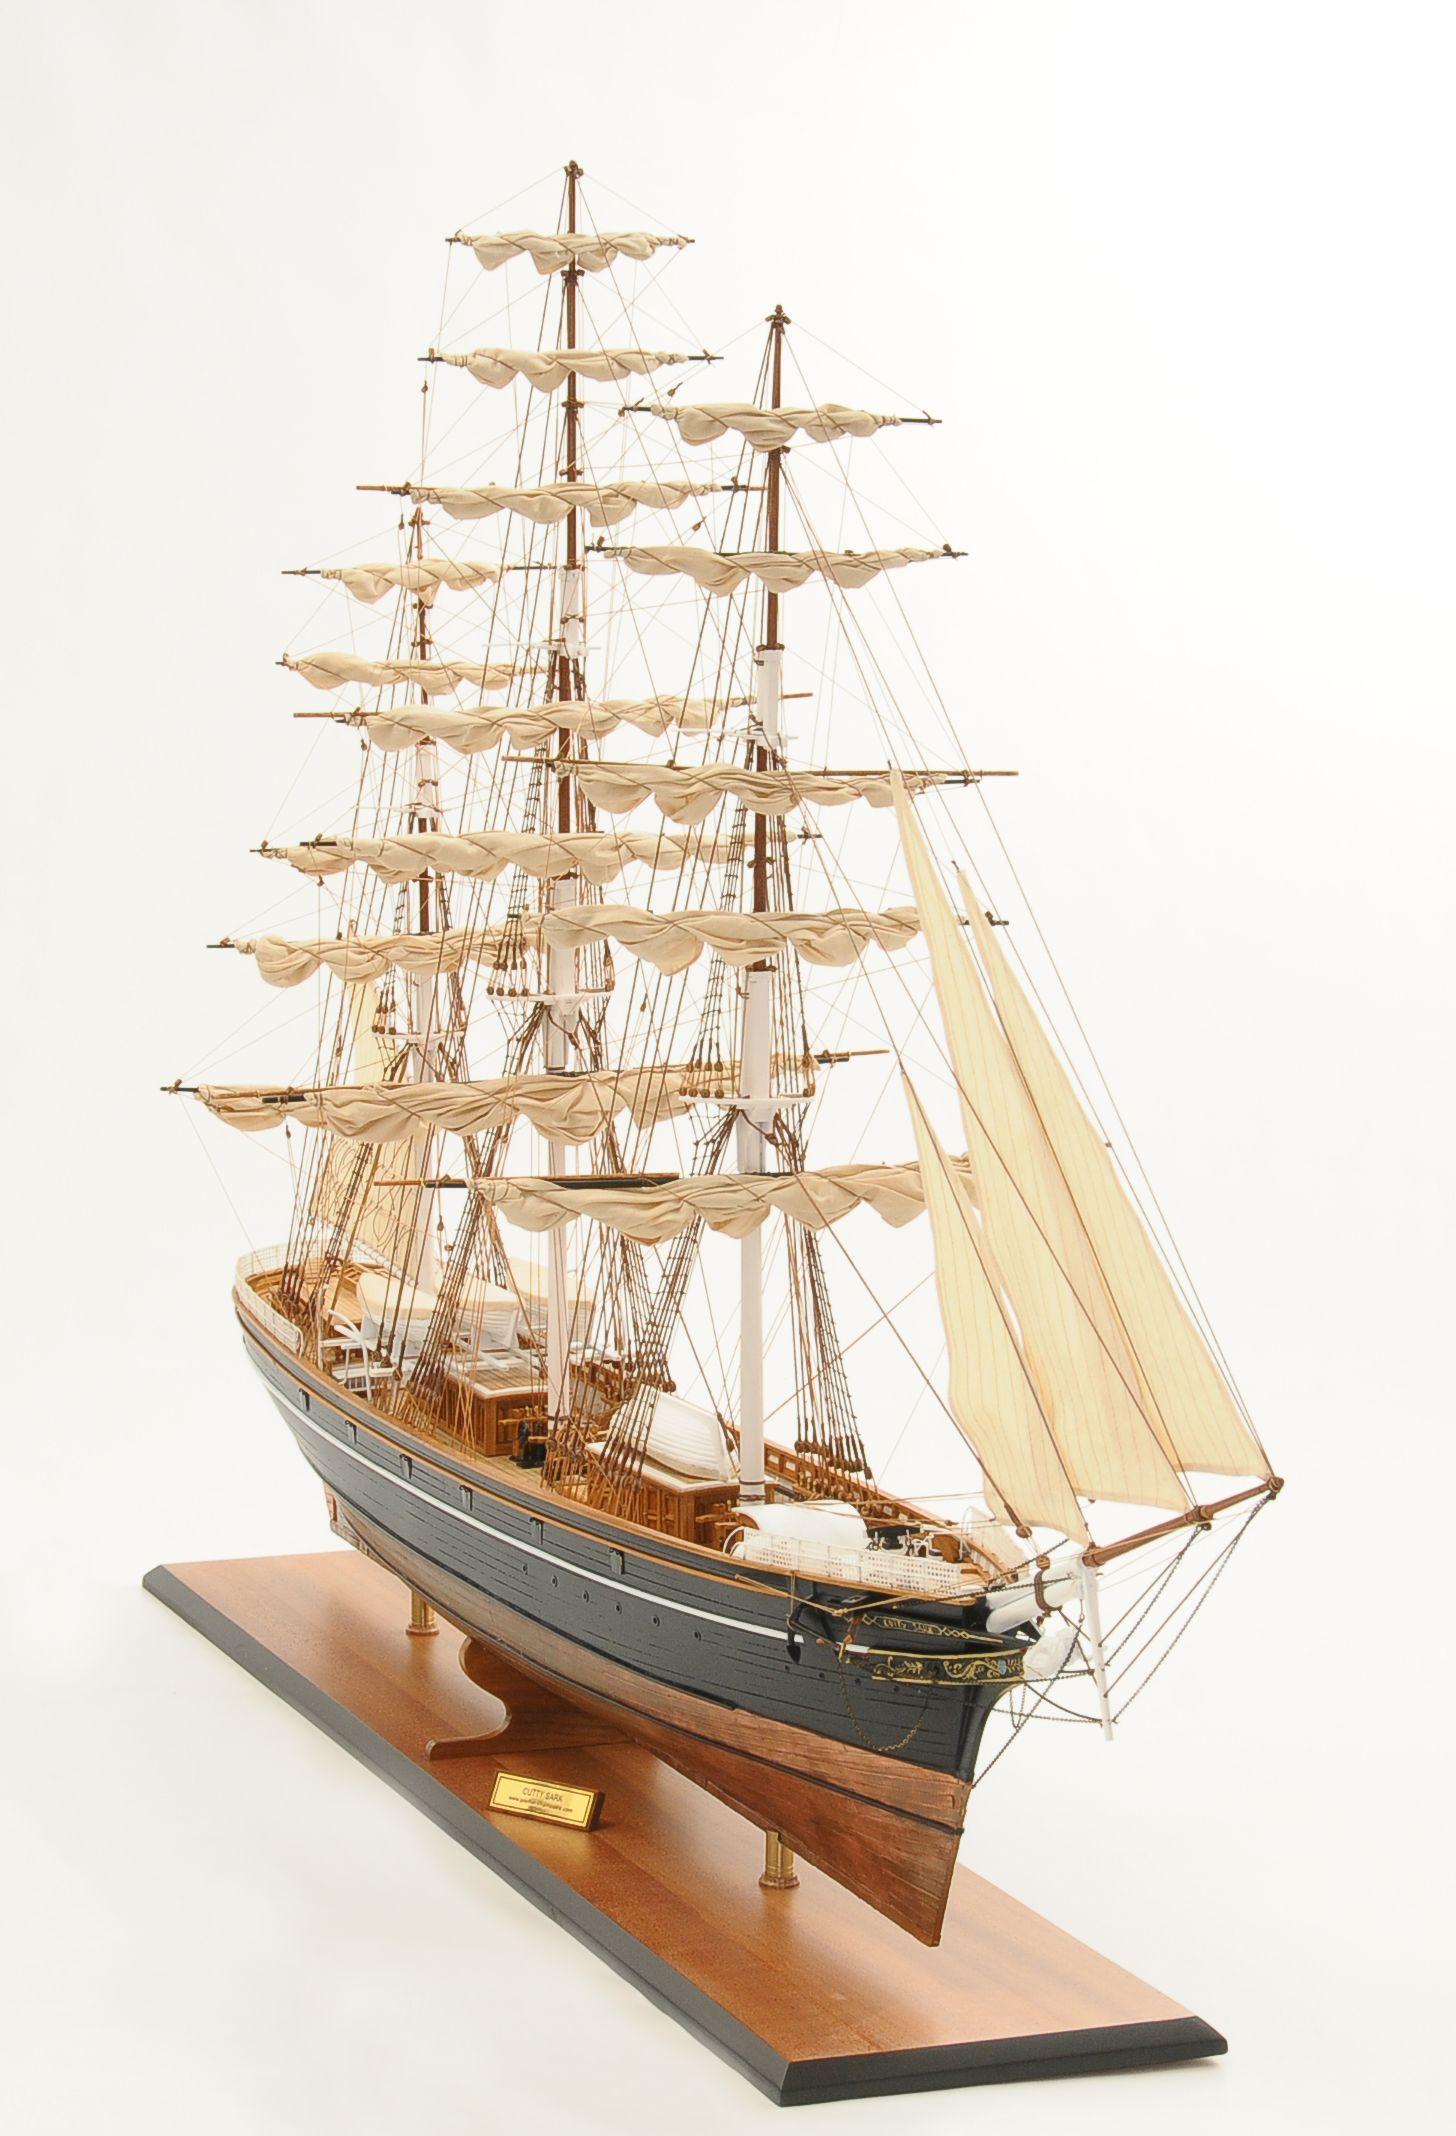 553-8665-Cutty-Sark-model-ship-Premier-Range